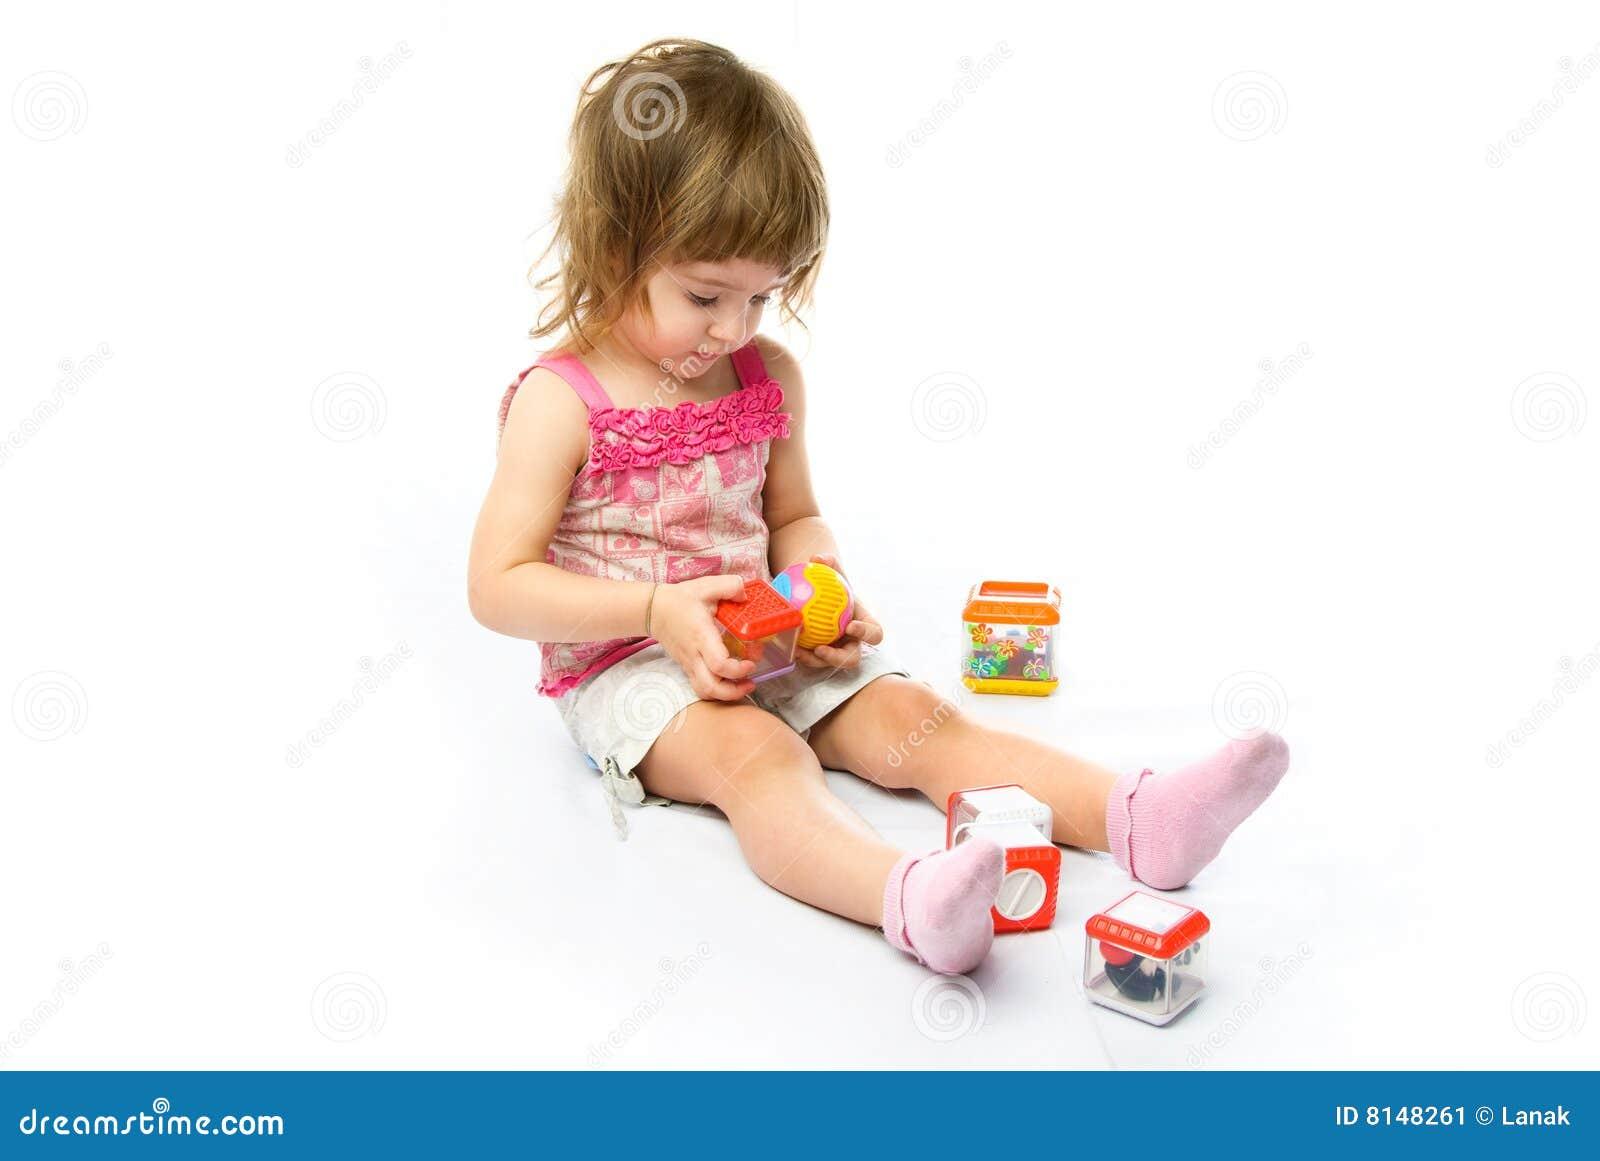 Girls Outdoor Play Toys - ToysRUs